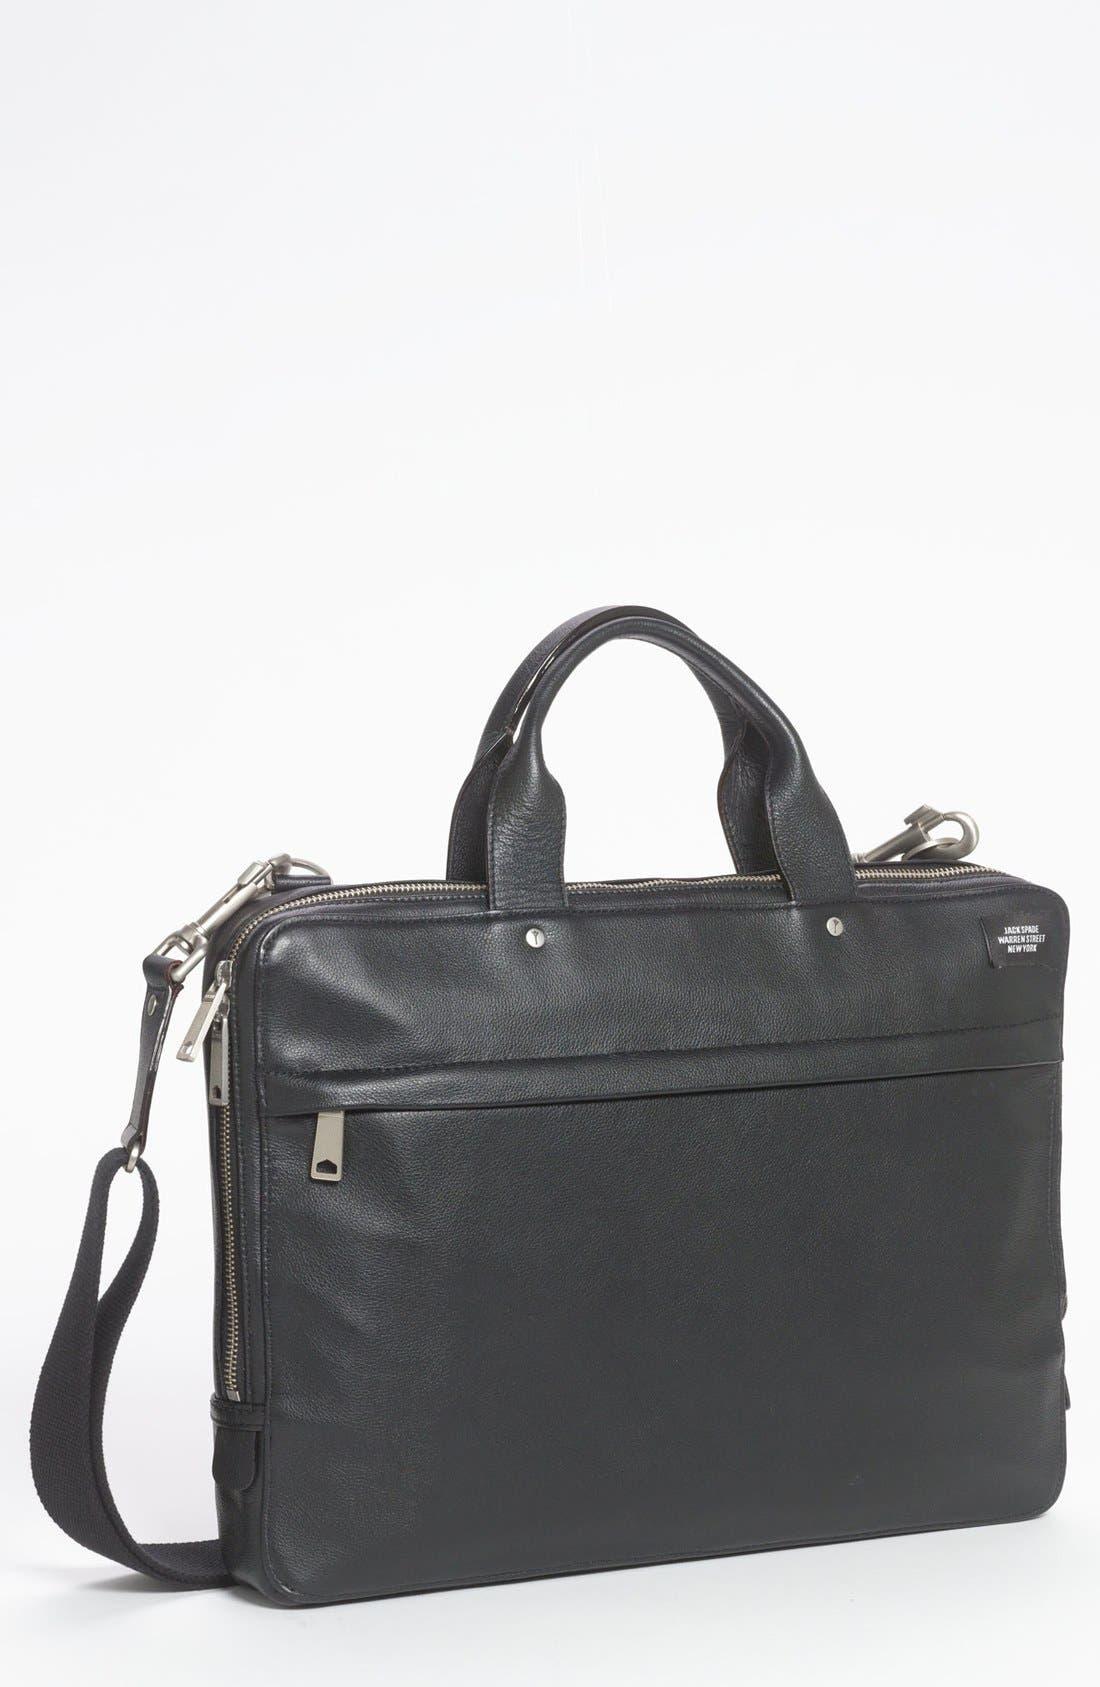 JACK SPADE Slim Leather Briefcase, Main, color, 001